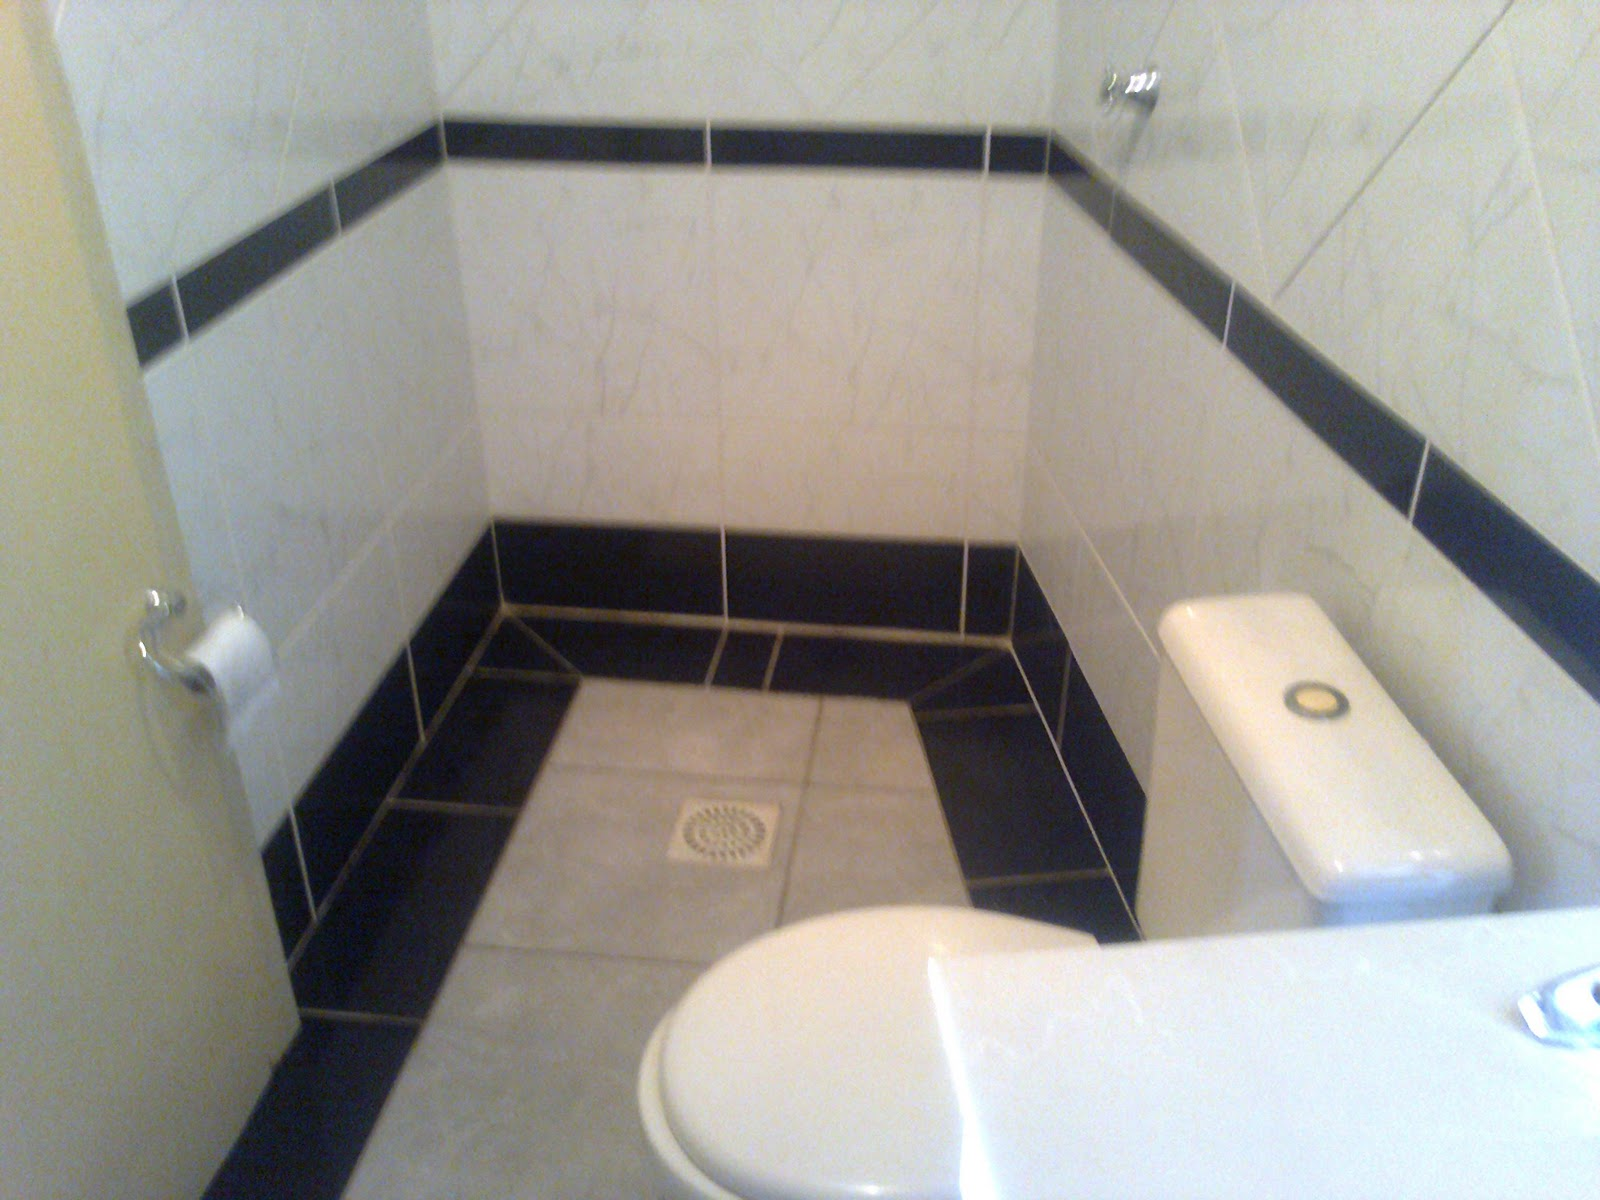 Banheiro simples #41495B 1600x1200 Azulejo Banheiro Simples